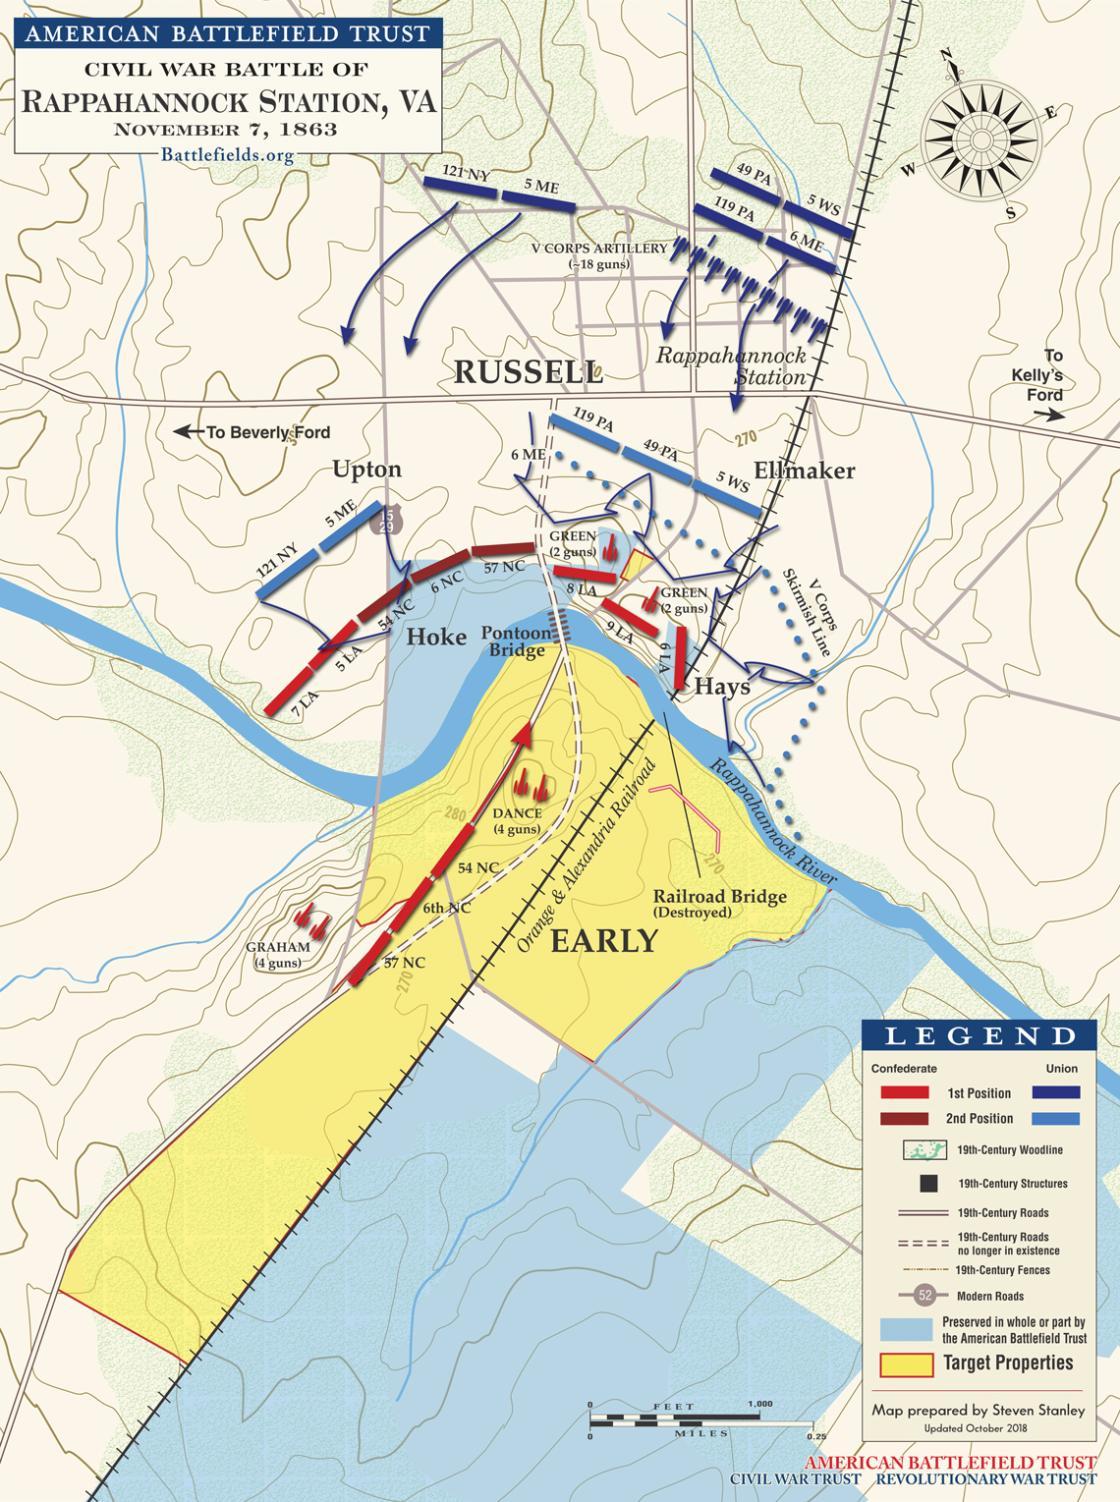 The Battle of Rappahannock Station - November 7, 1863